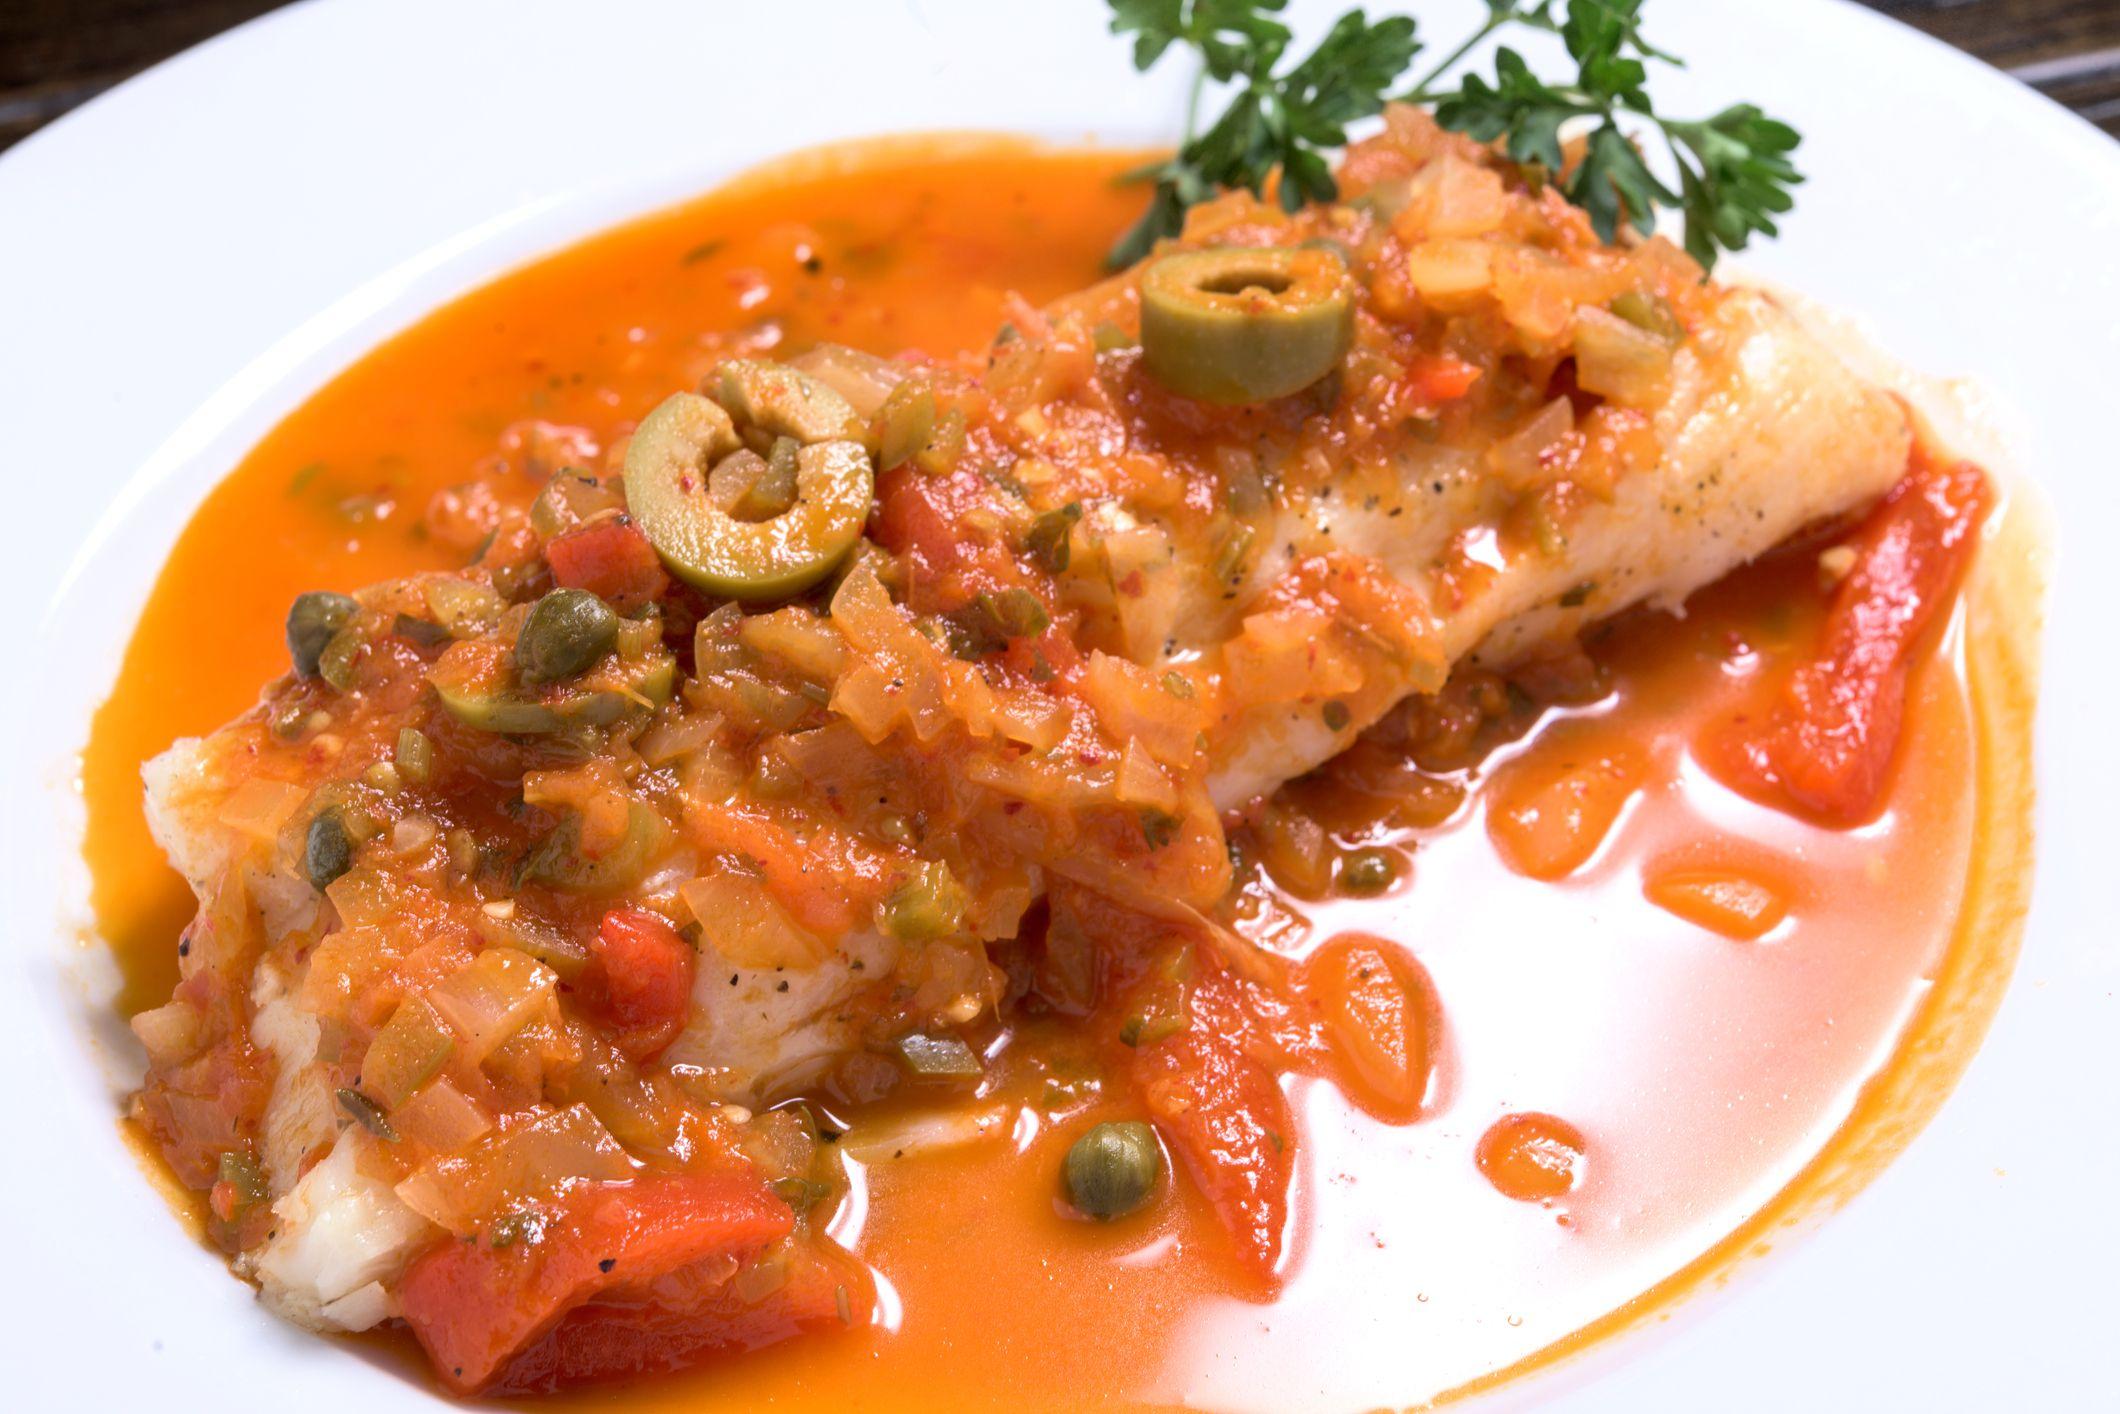 Enjoy the Mediterranean Influence of Traditional Veracruzan Fish Dish